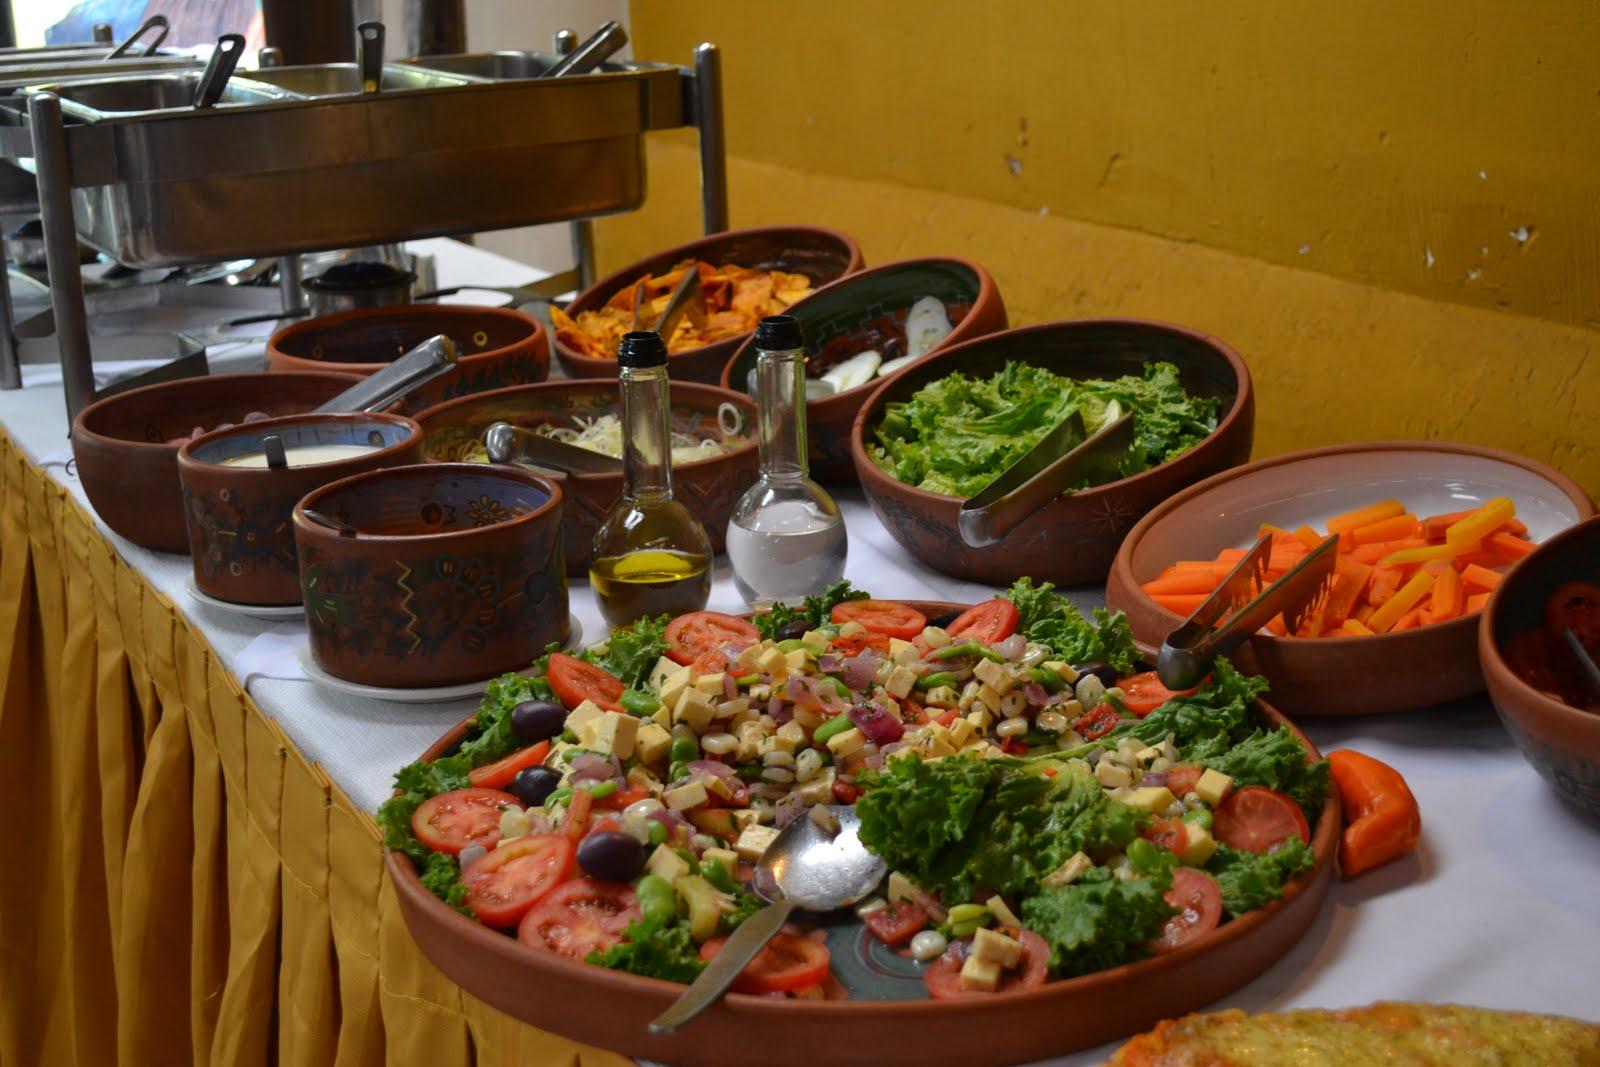 peruvian food comida peruana buy foods groceries - HD1600×1067